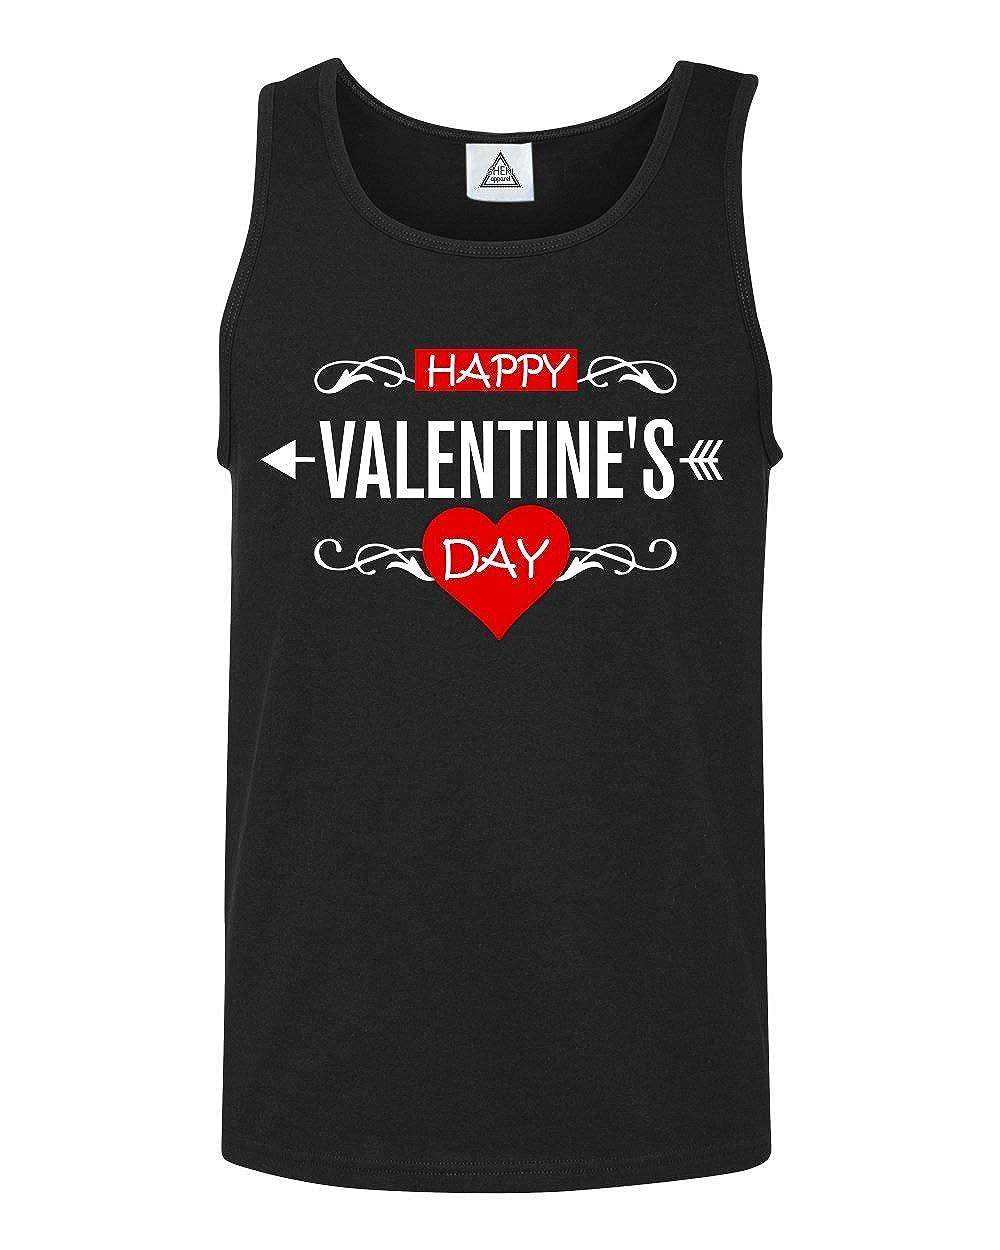 Sheki Apparel Happy Valentines Day Tank Top